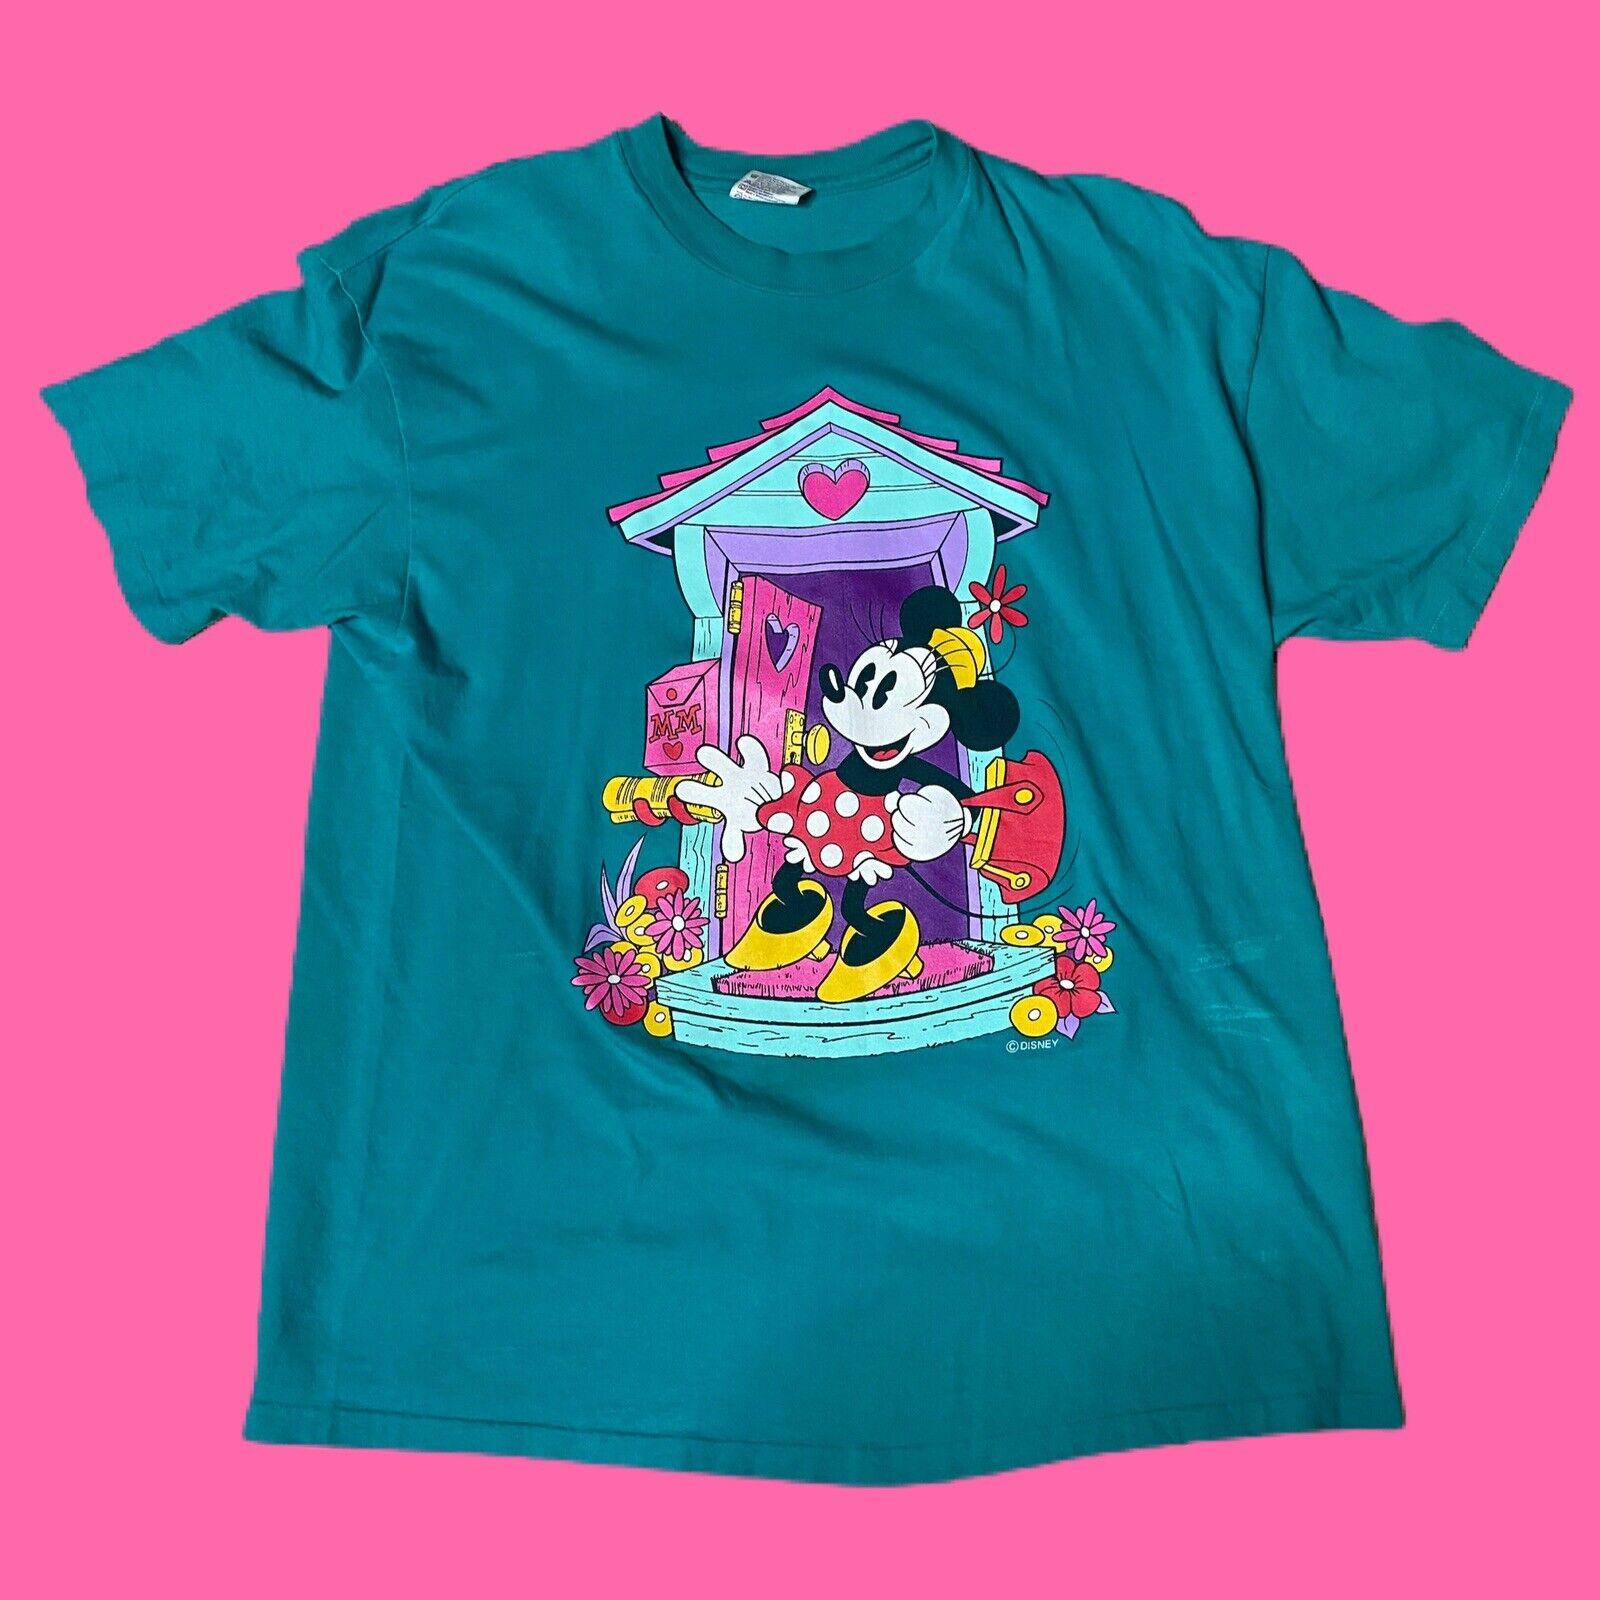 Vintage 90s Disney Minnie Mouse T-Shirt X-Large VTG Single stitched USA